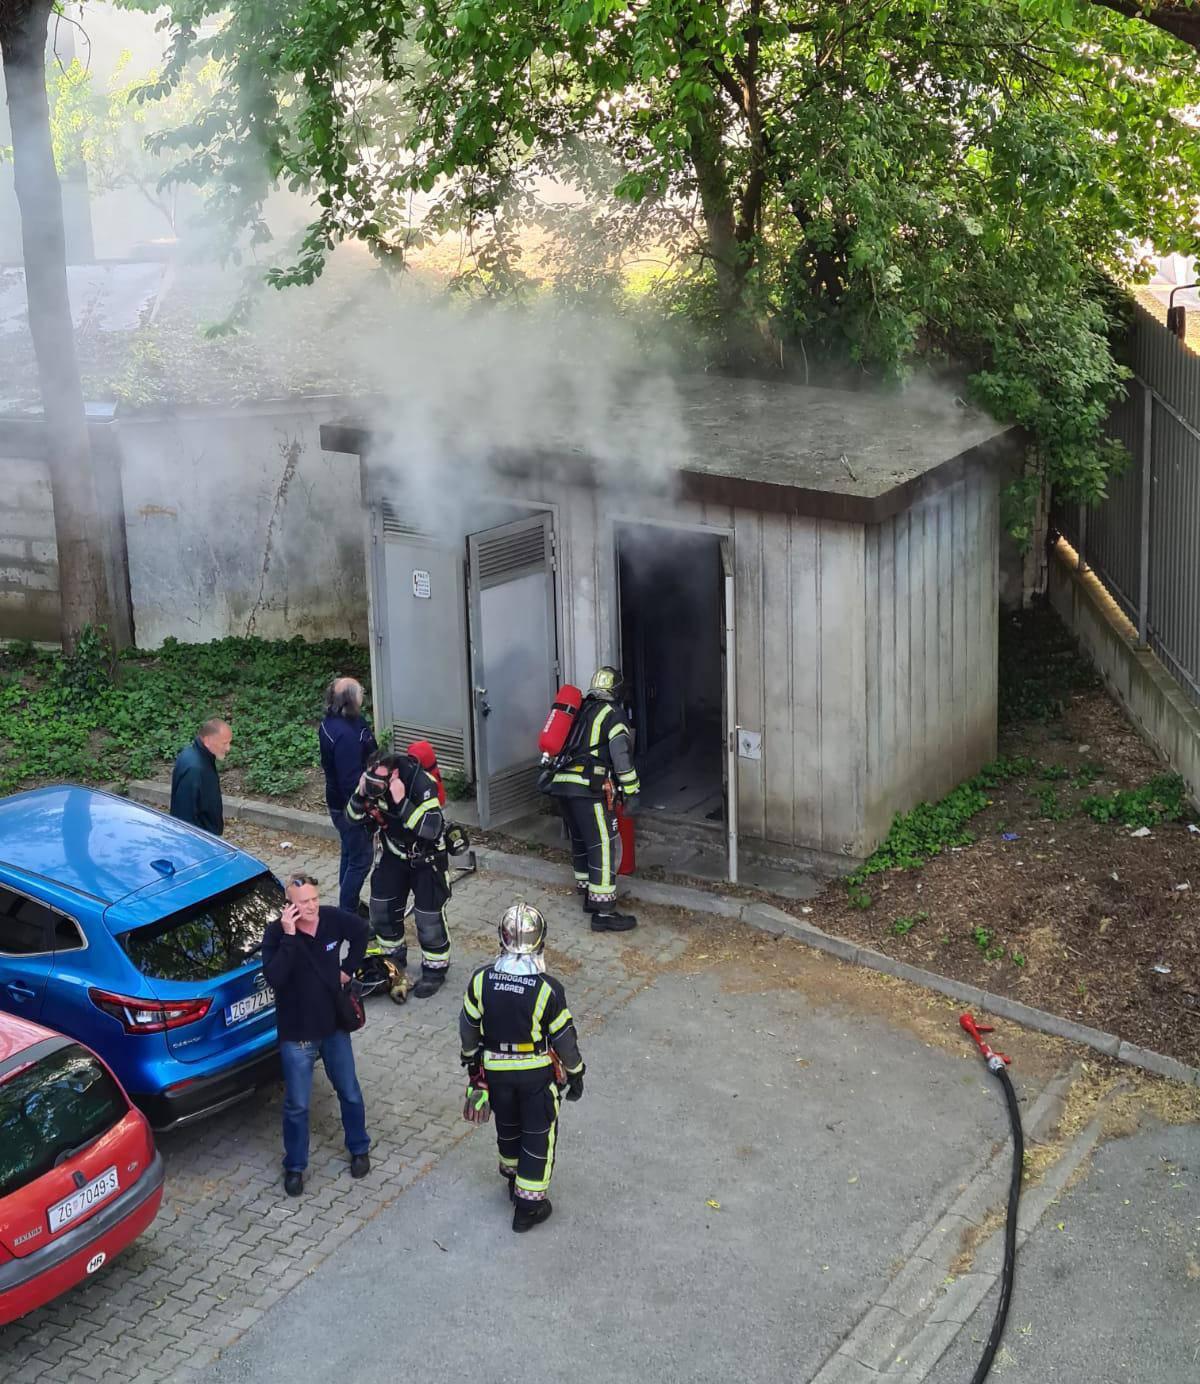 Zbog požara trafostanice u Maksimiru stotine bez struje